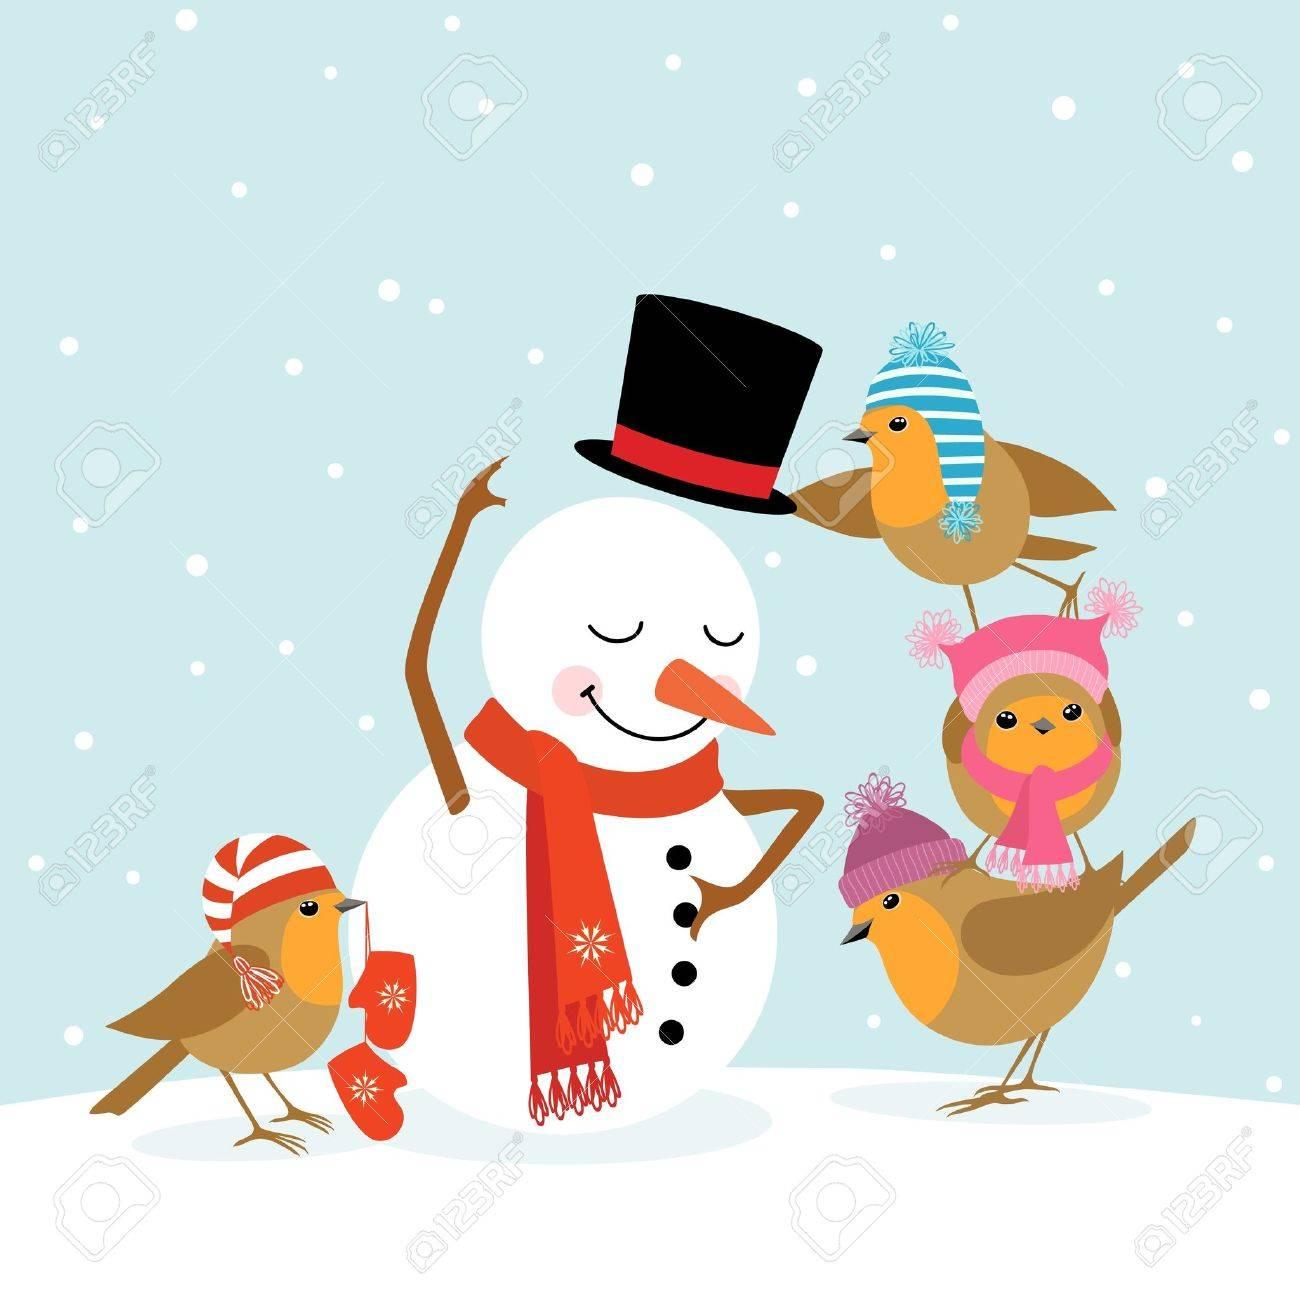 Funny Robins birds making a snowman. Stock Vector - 16211146